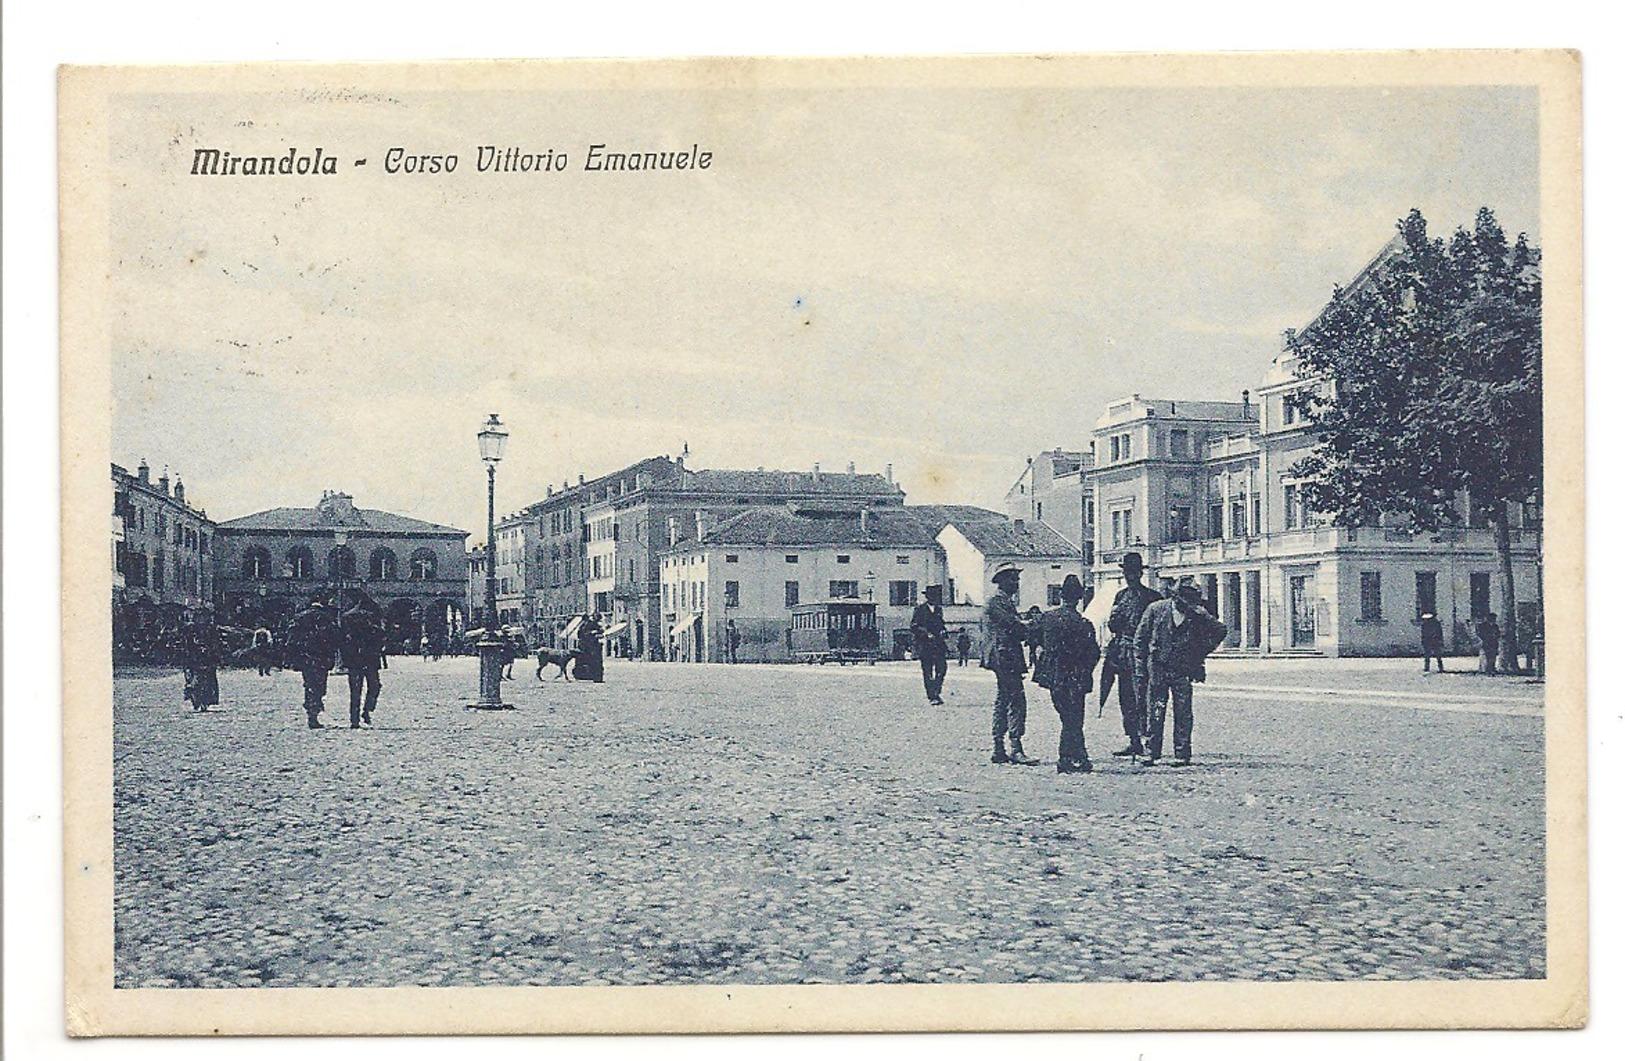 MIRANDOLA - CORSO VITTORIO EMANUELE - Modena